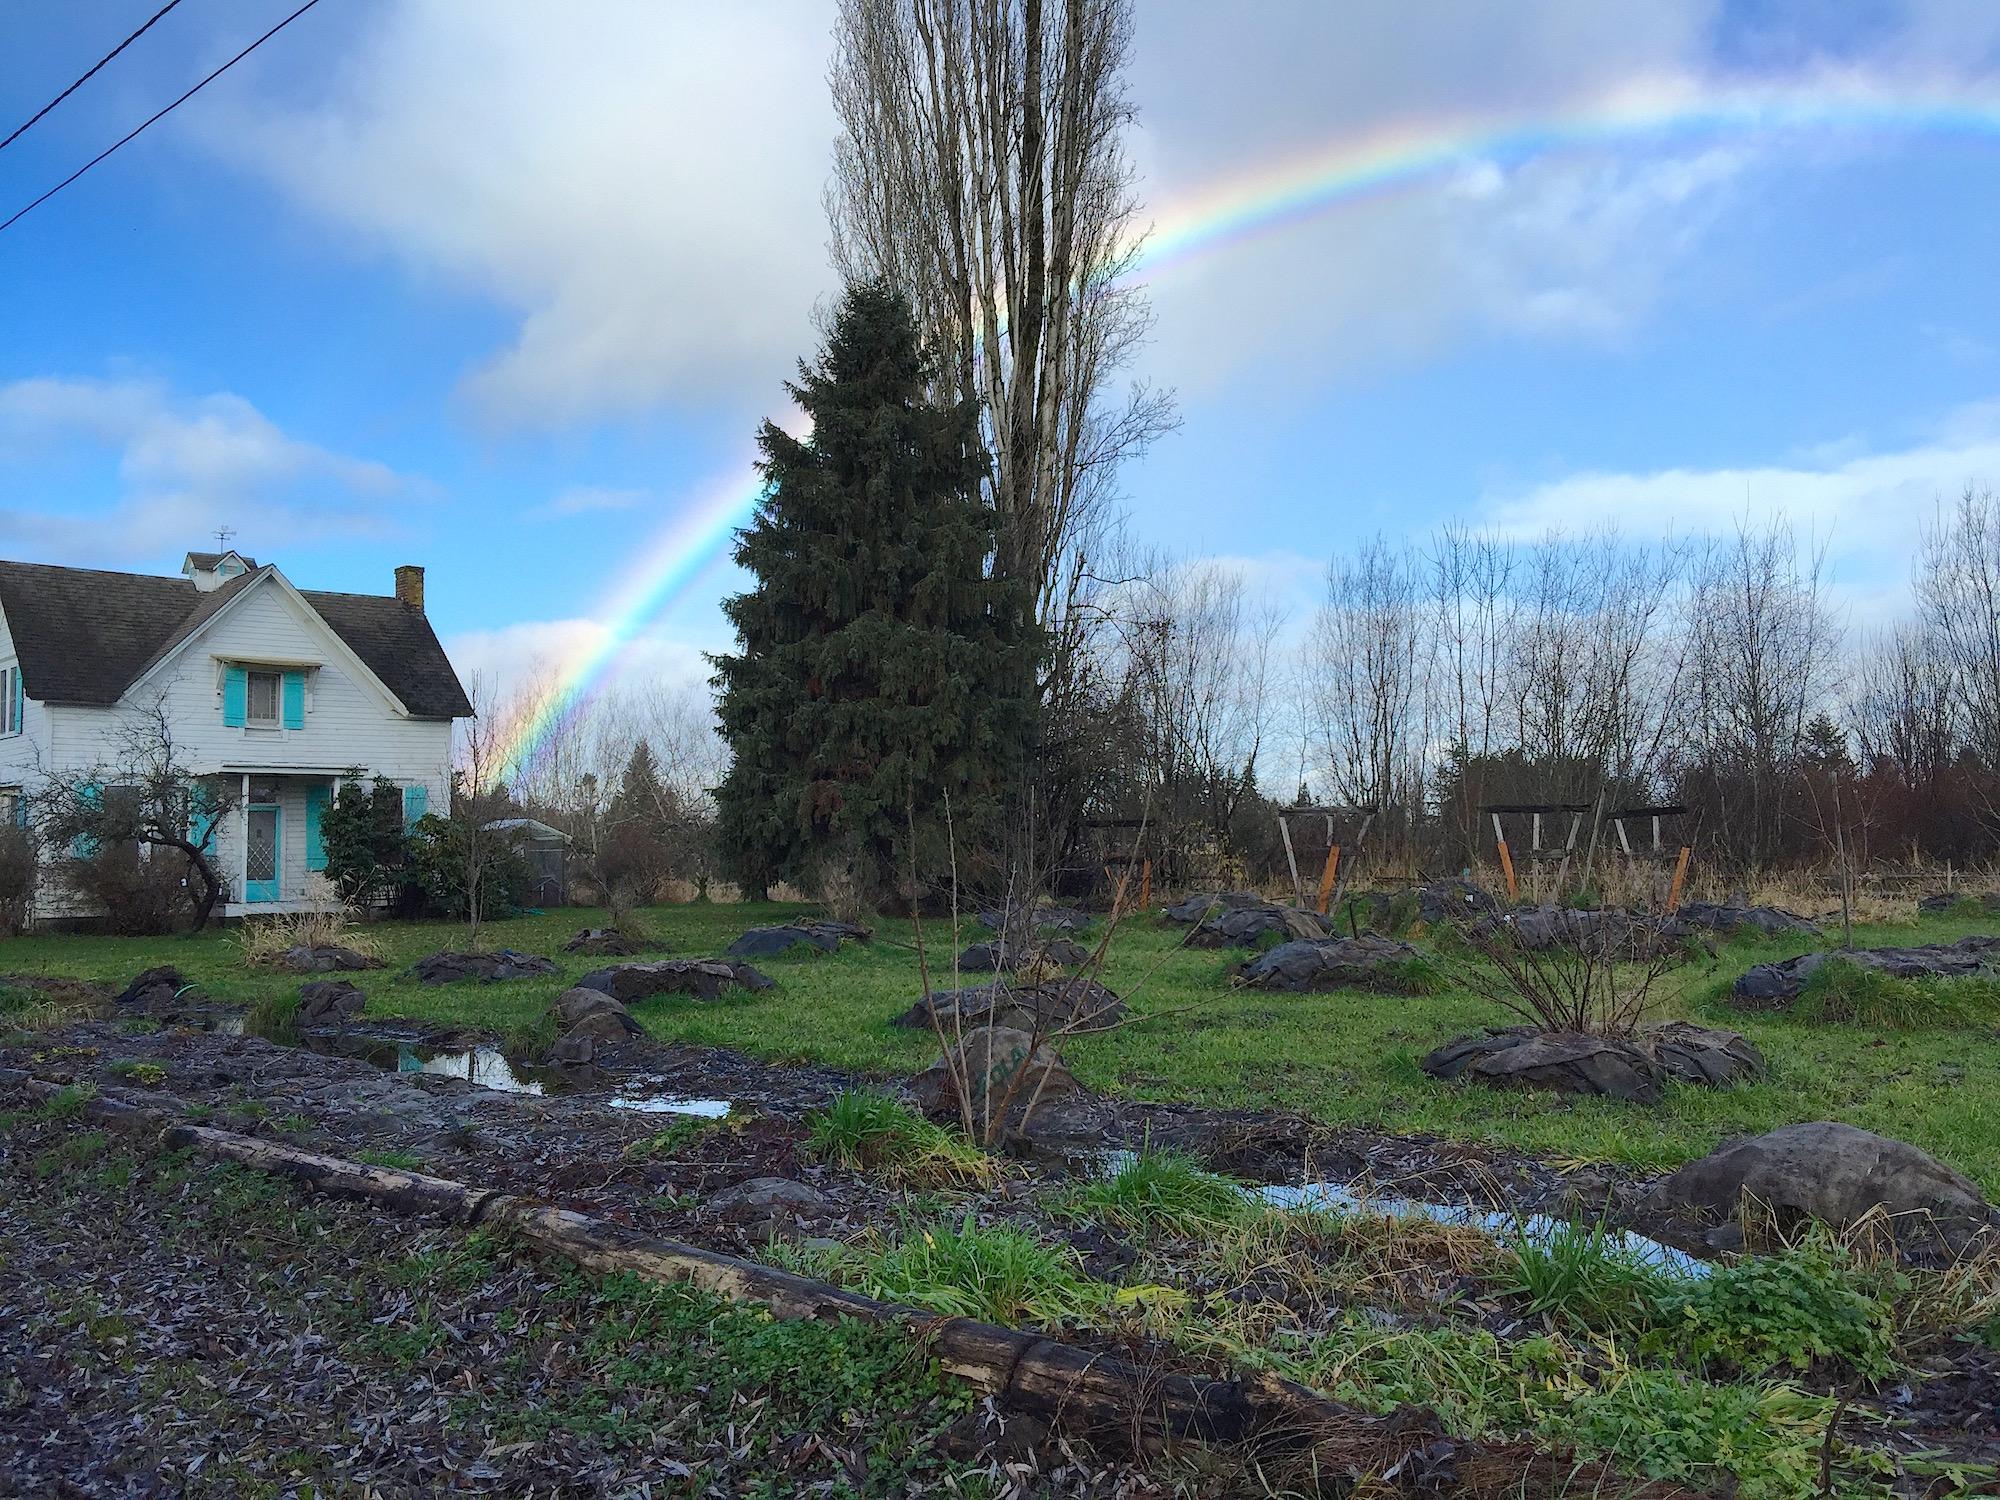 Day 20: Blue Skye Farm Permaculture Design, Blueberry Mulching & Community Garden Installation